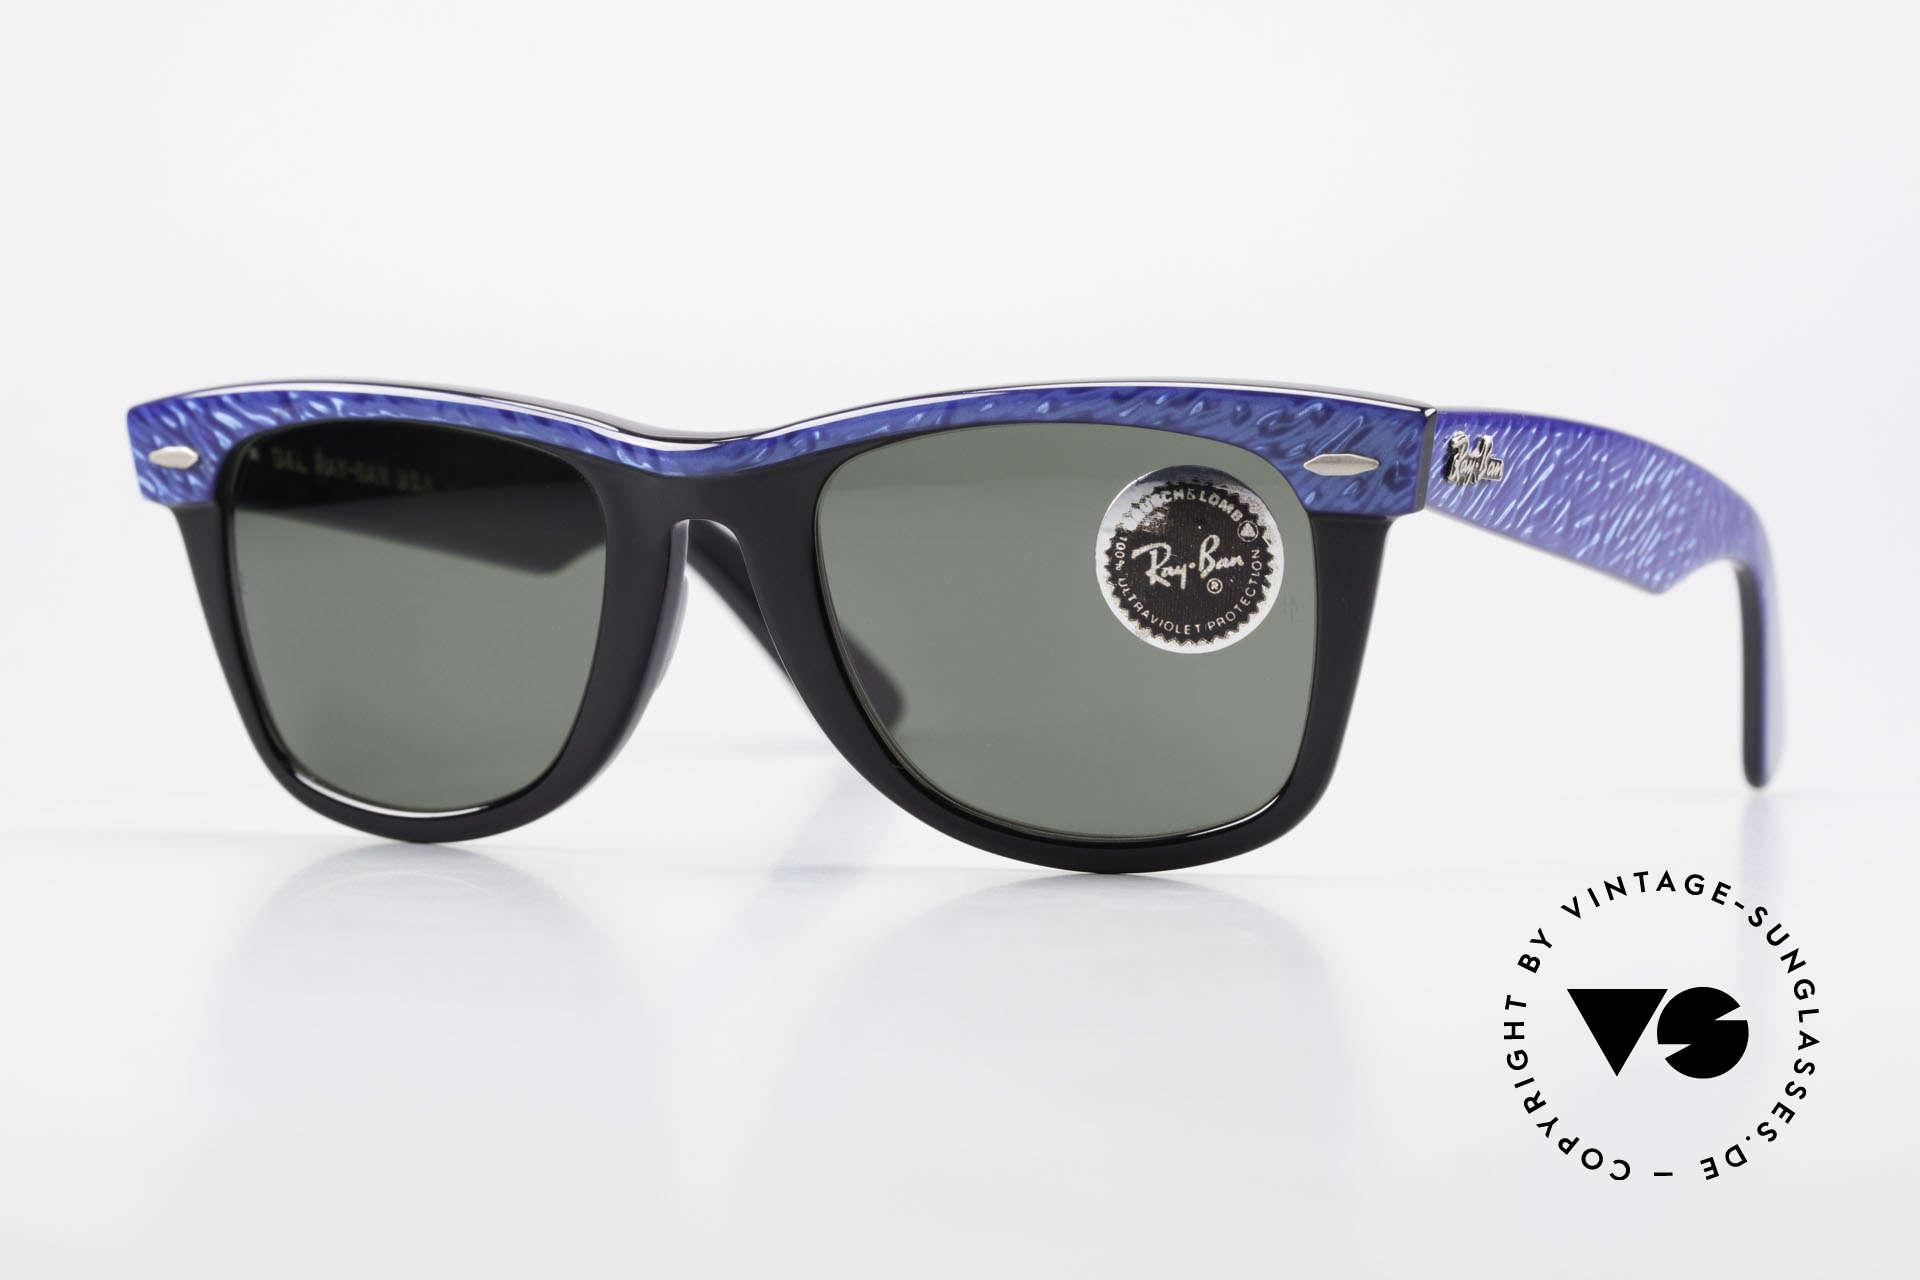 Ray Ban Wayfarer I Old 80's Bausch Lomb Ray-Ban, old Ray-Ban Wayfarer 1980's sunglasses, U.S.A., Made for Men and Women